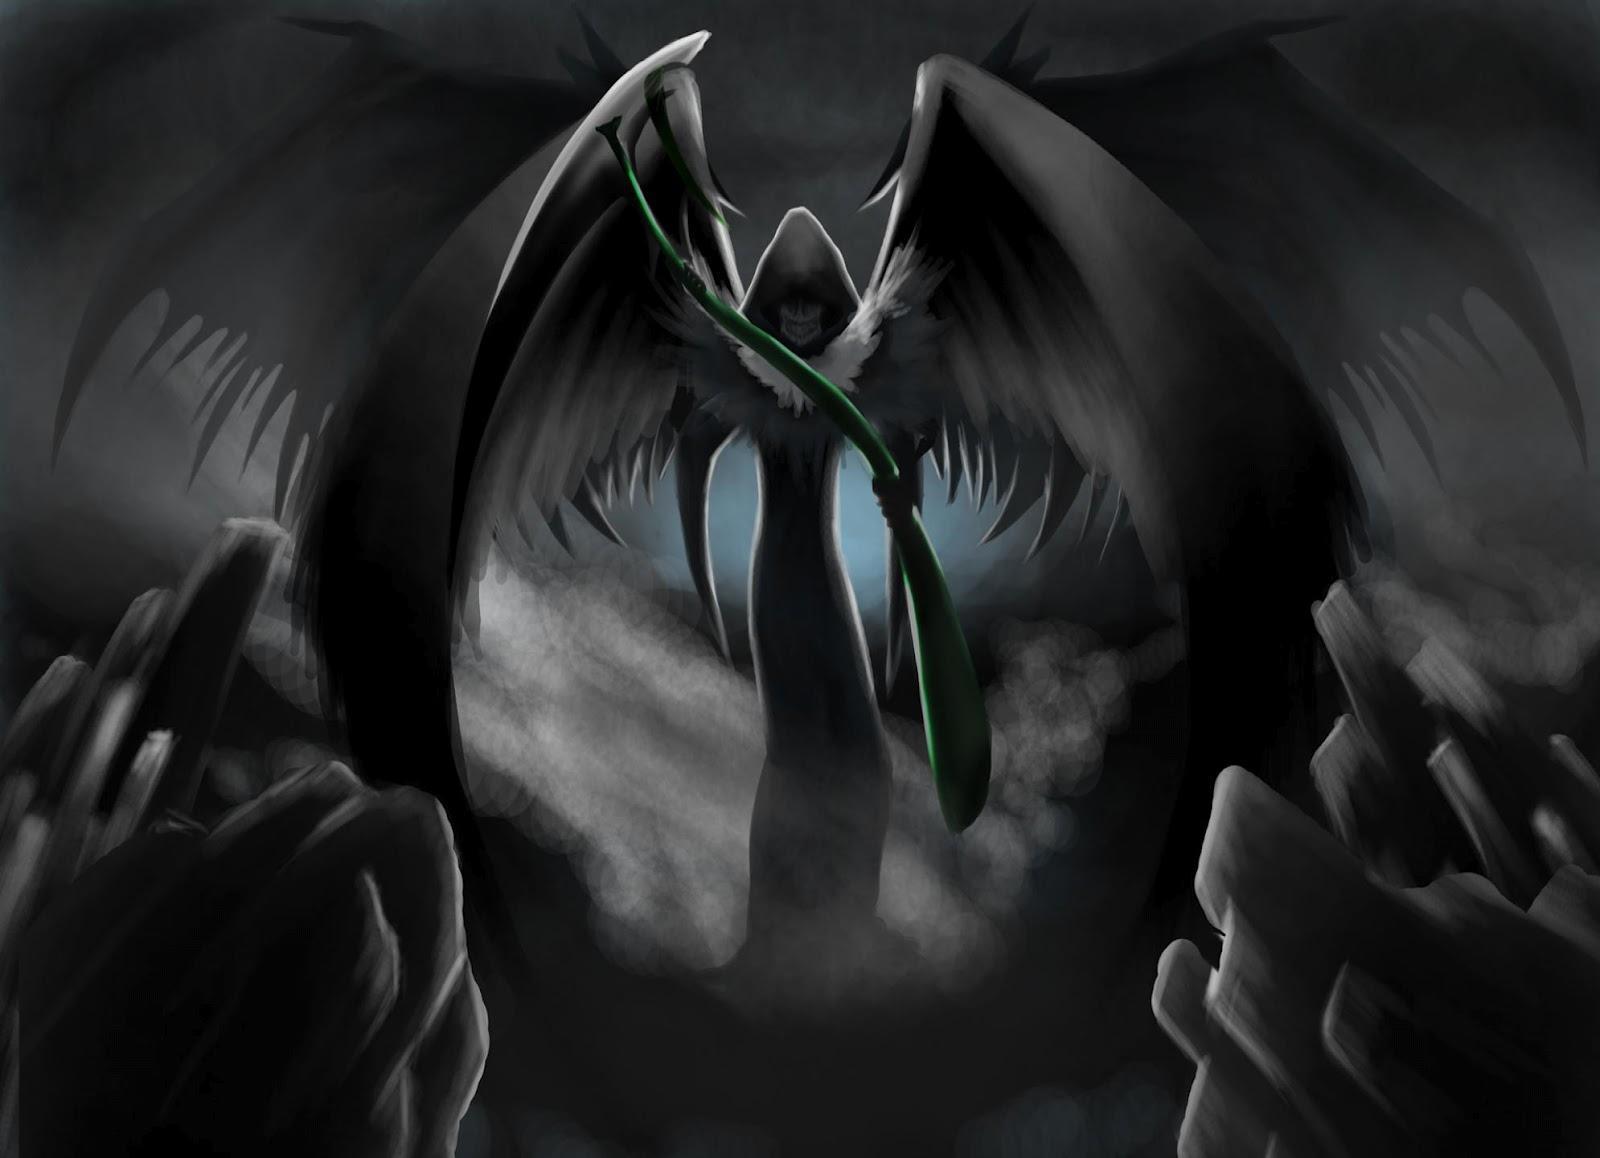 black christmas wallpaper,batman,black and white,fictional character,cg artwork,photography